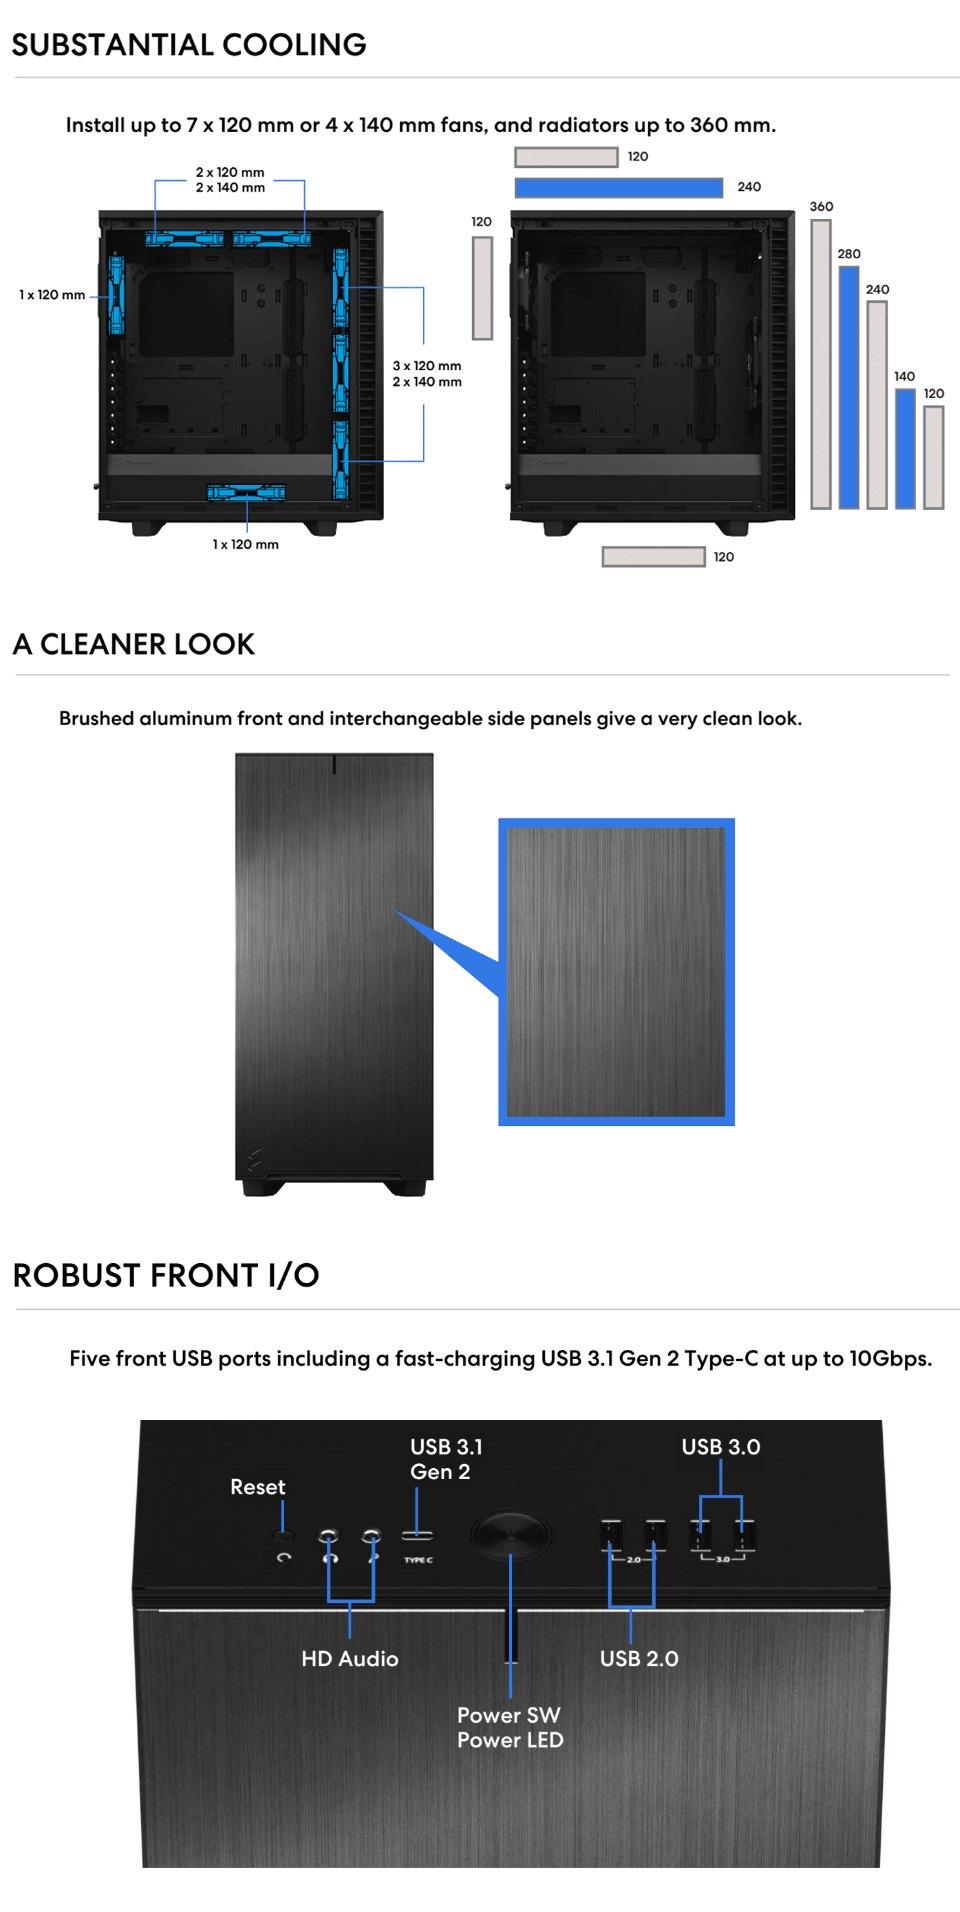 Fractal Design Define 7 Compact TG Light Tint features 3